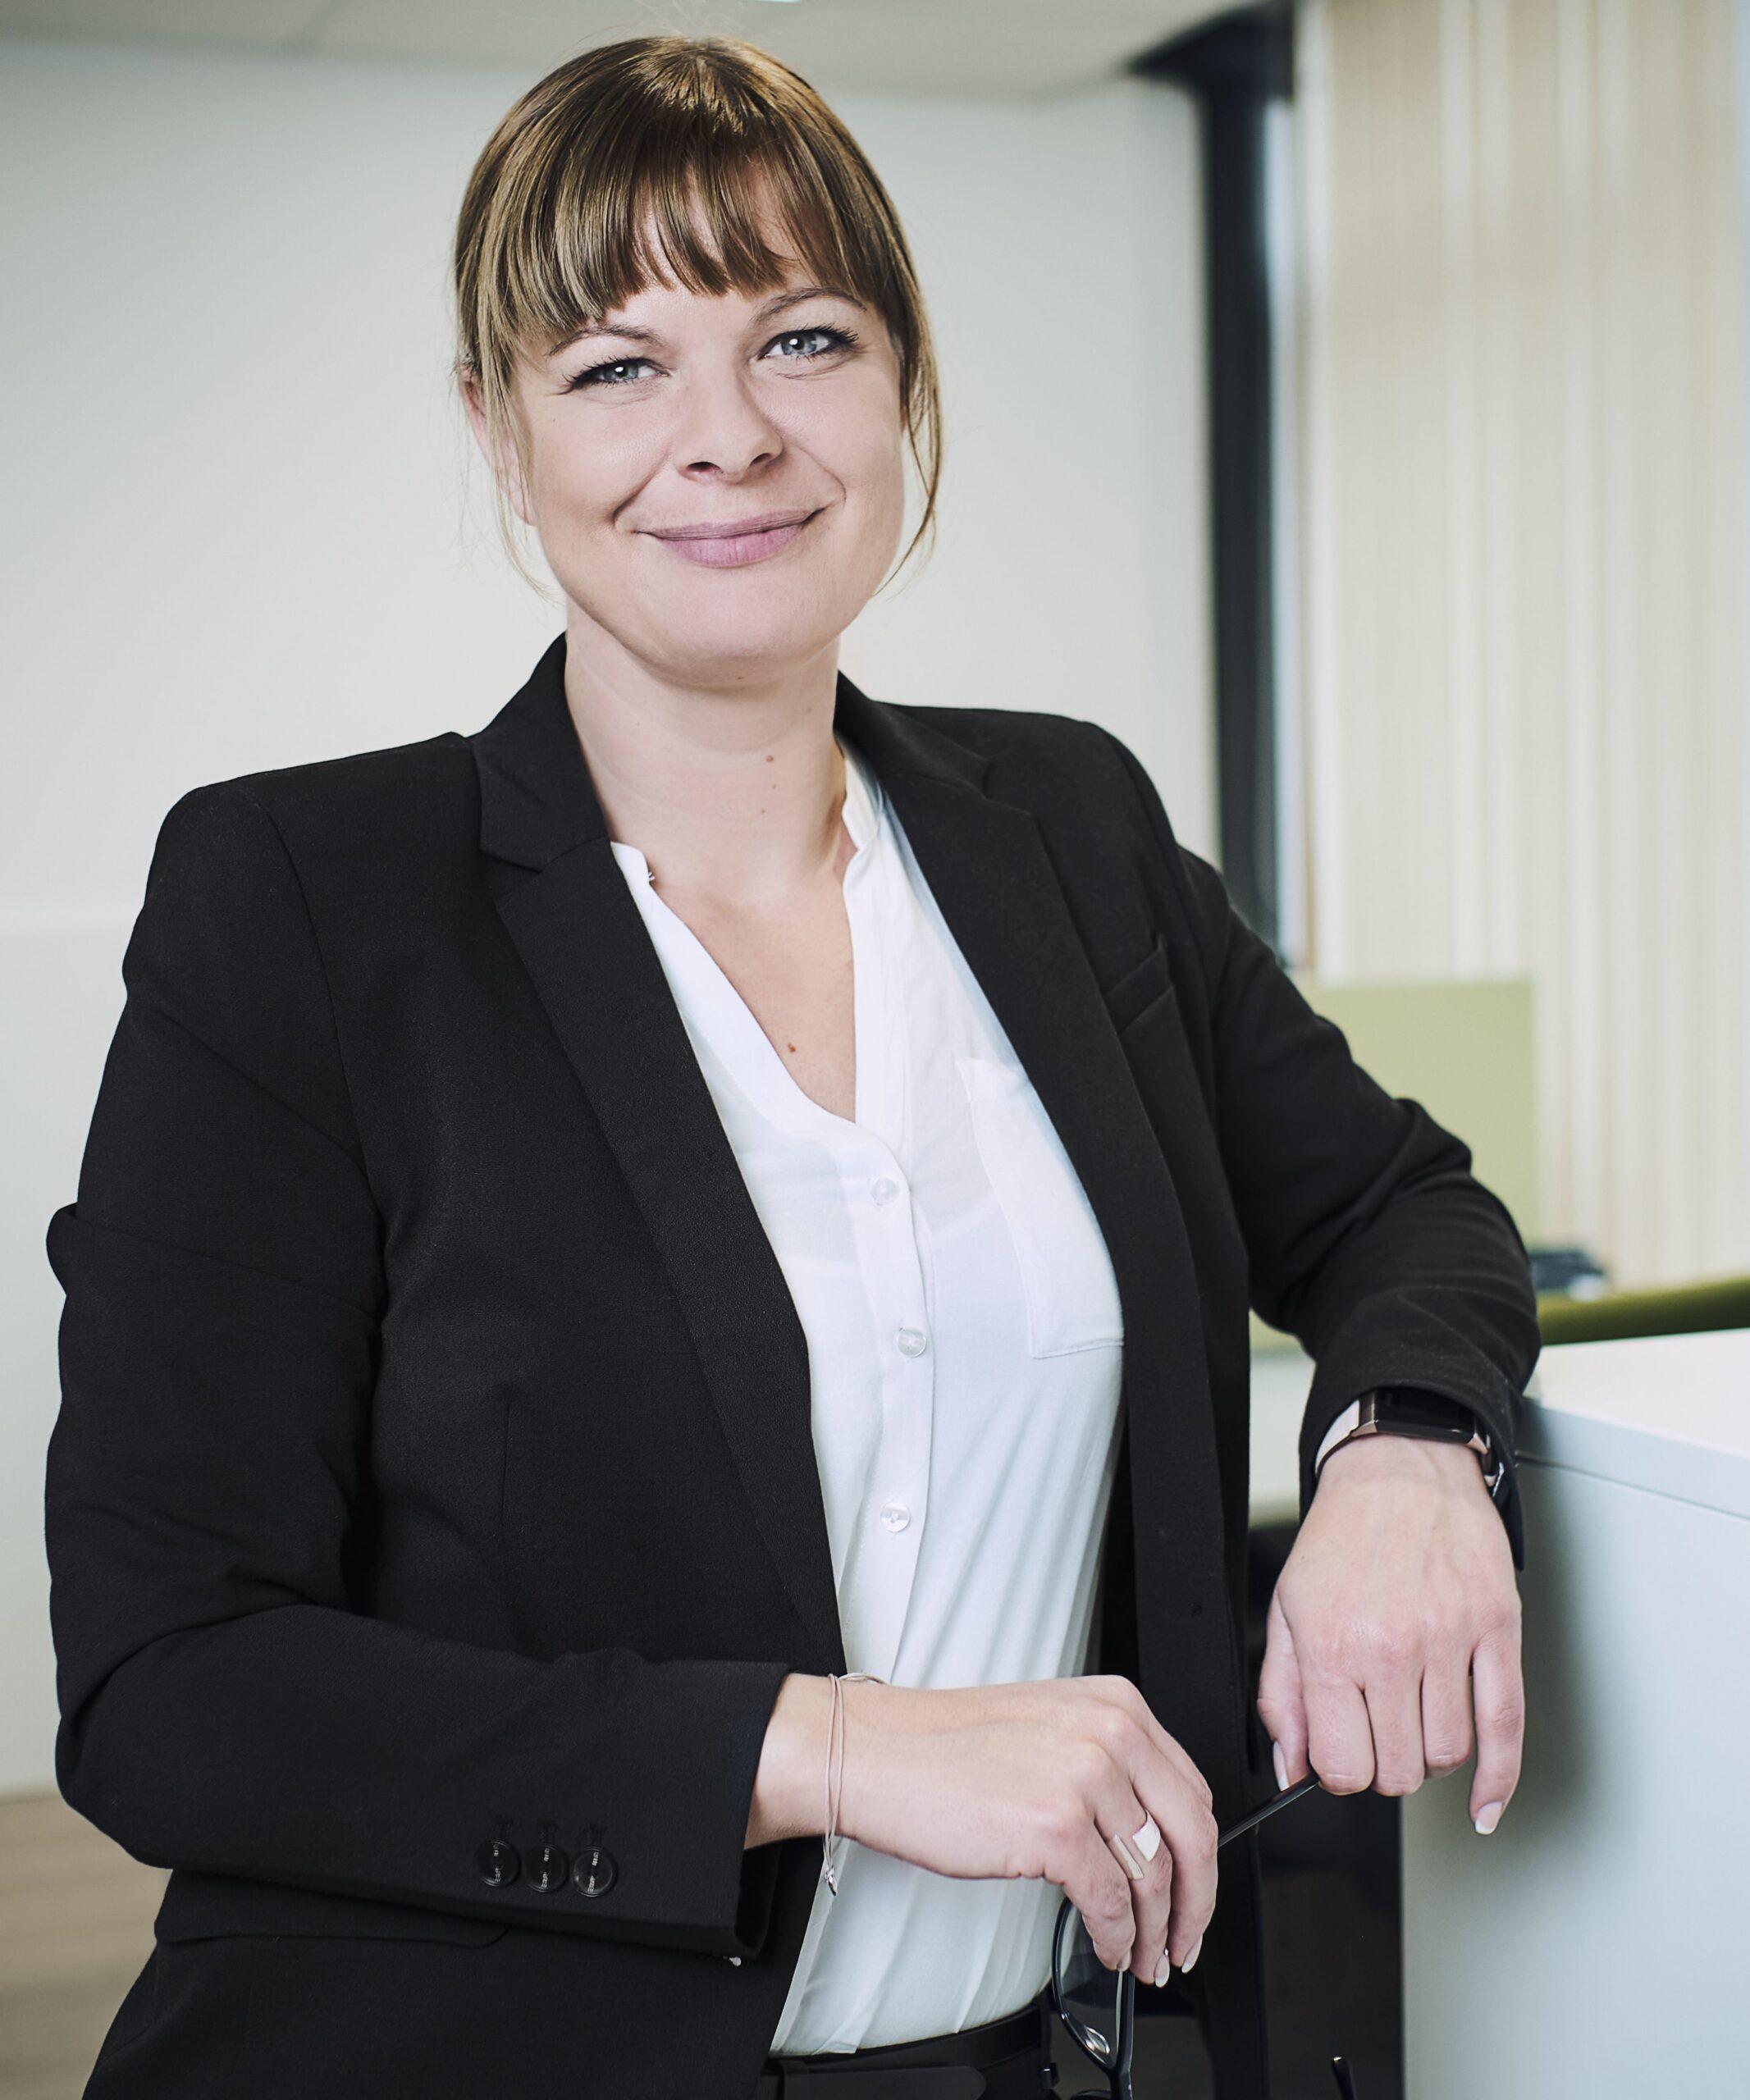 Lena Dröge